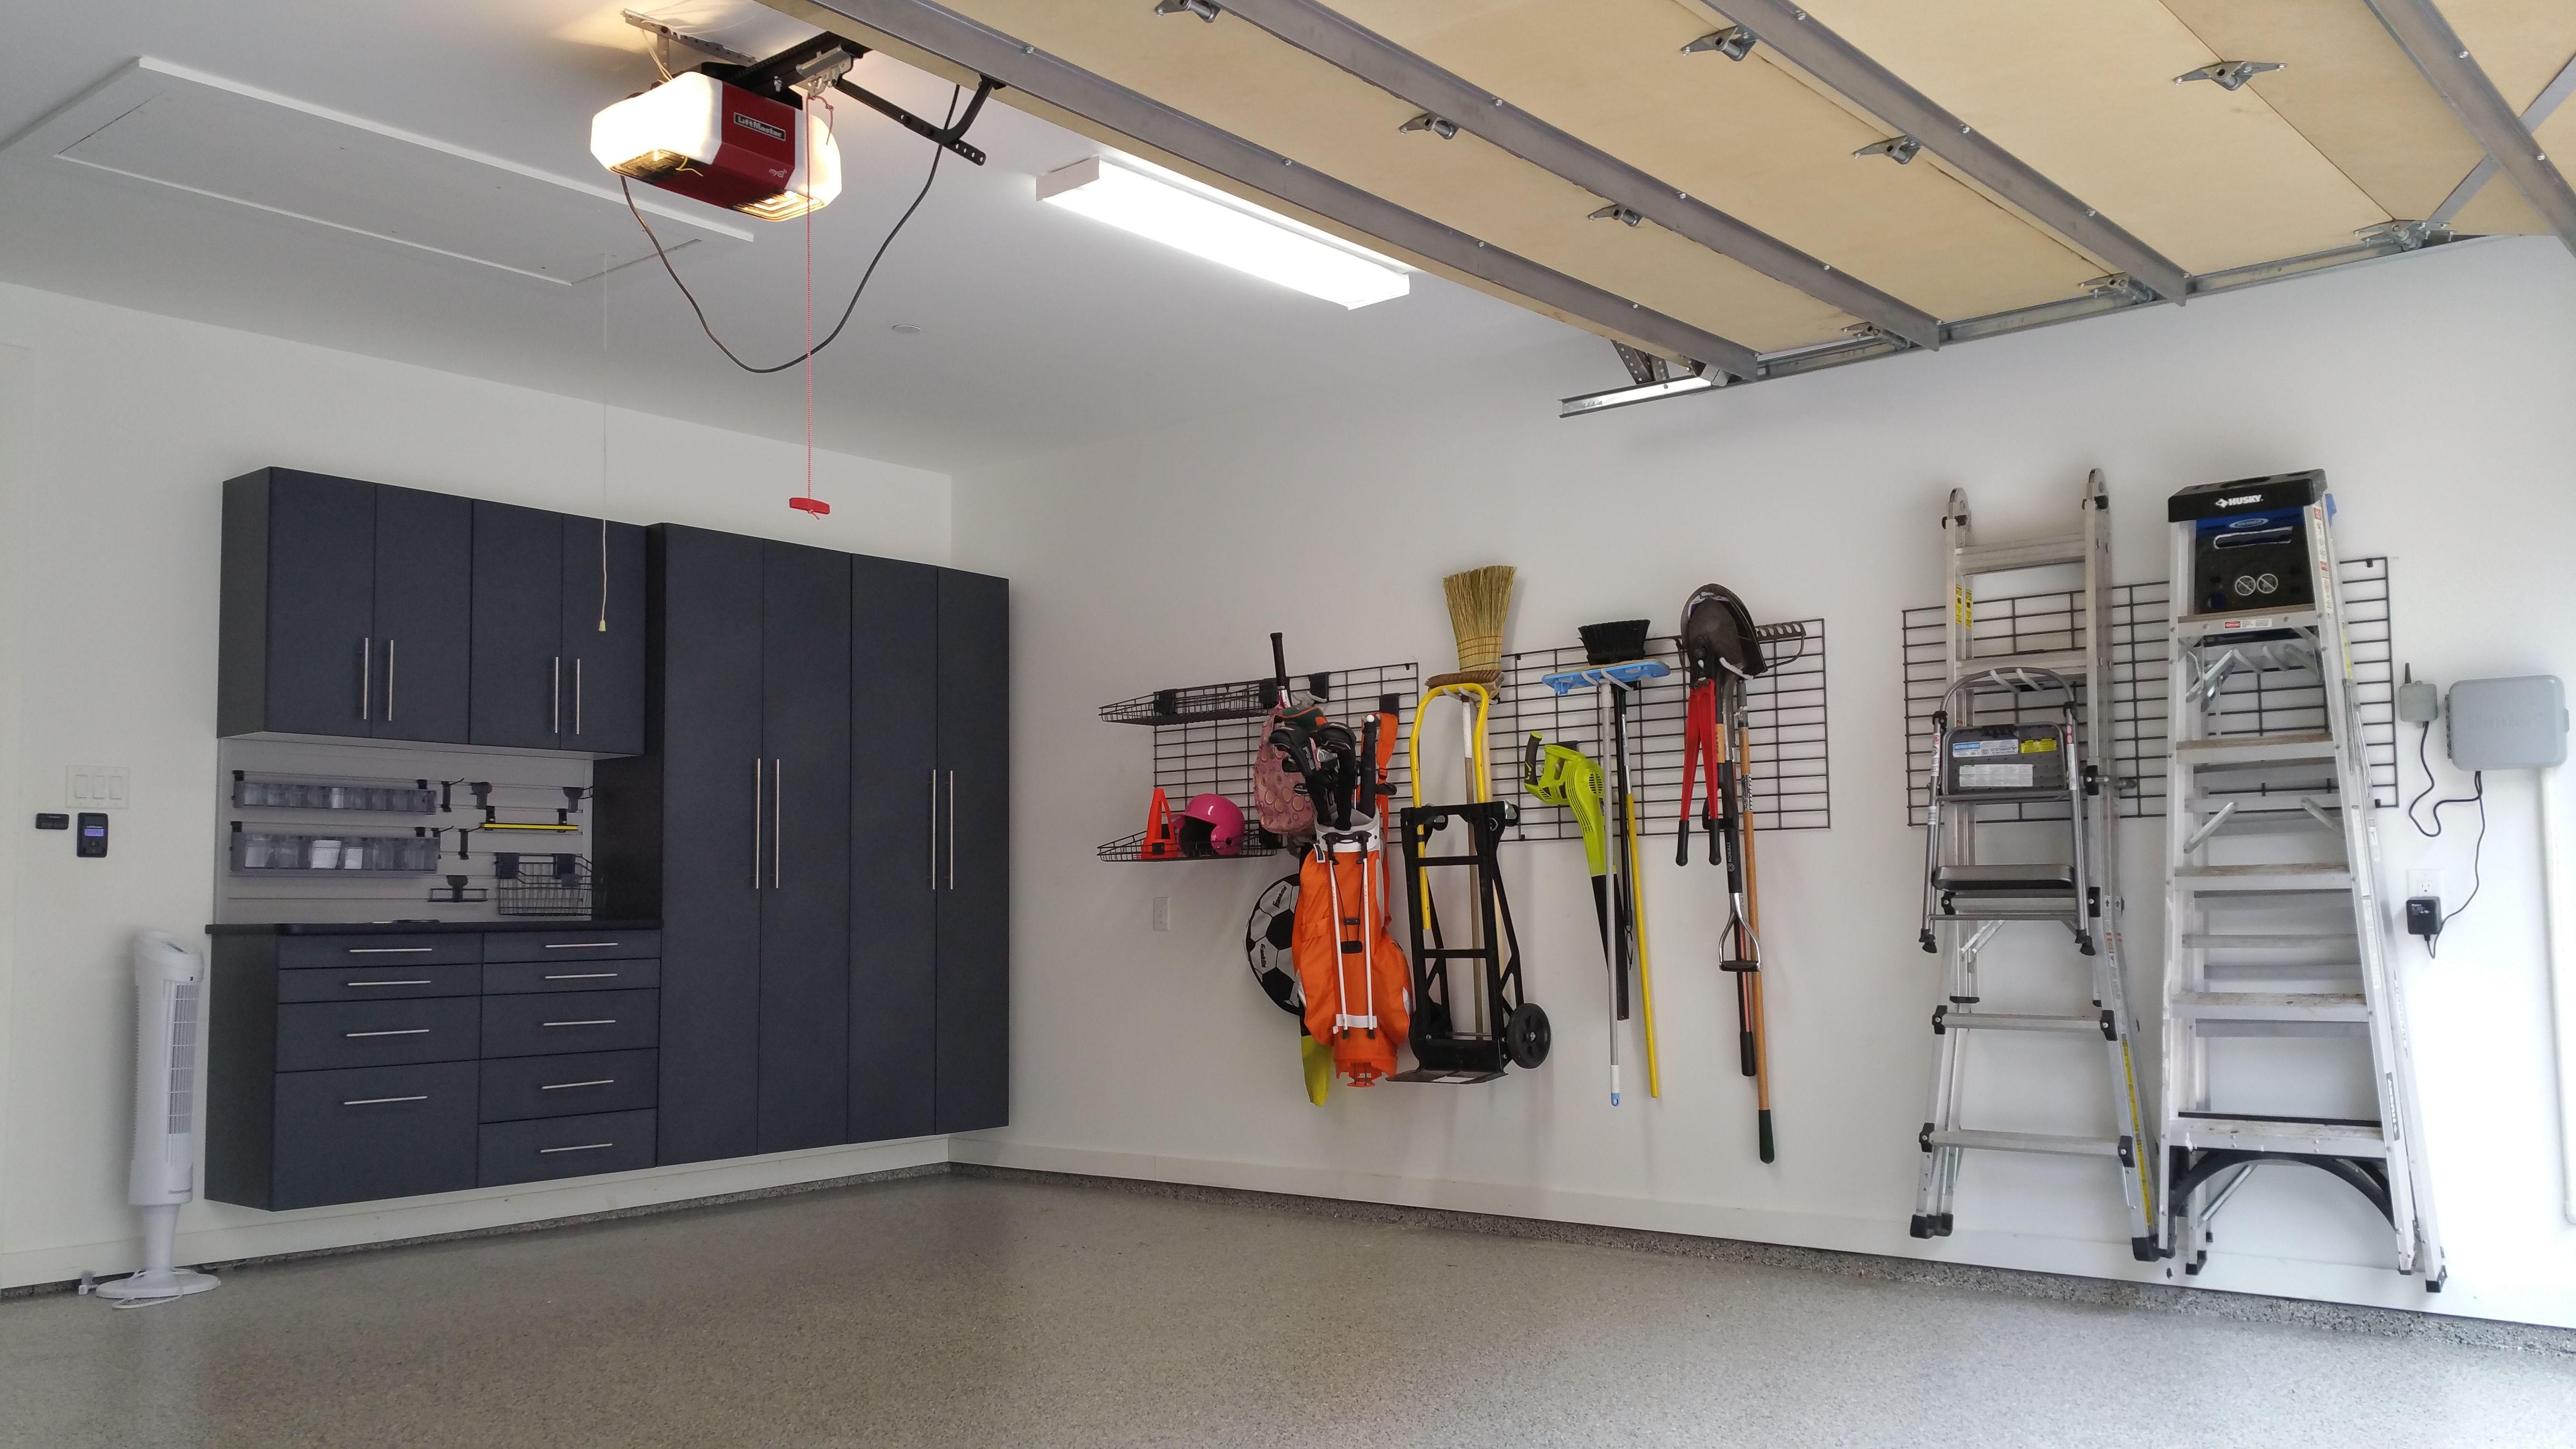 Amazing Garage Organization From Monkey Bar Storage Cabinets Shelving Epoxy Flooring Storage Monkey Bar Storage Garage Storage Systems